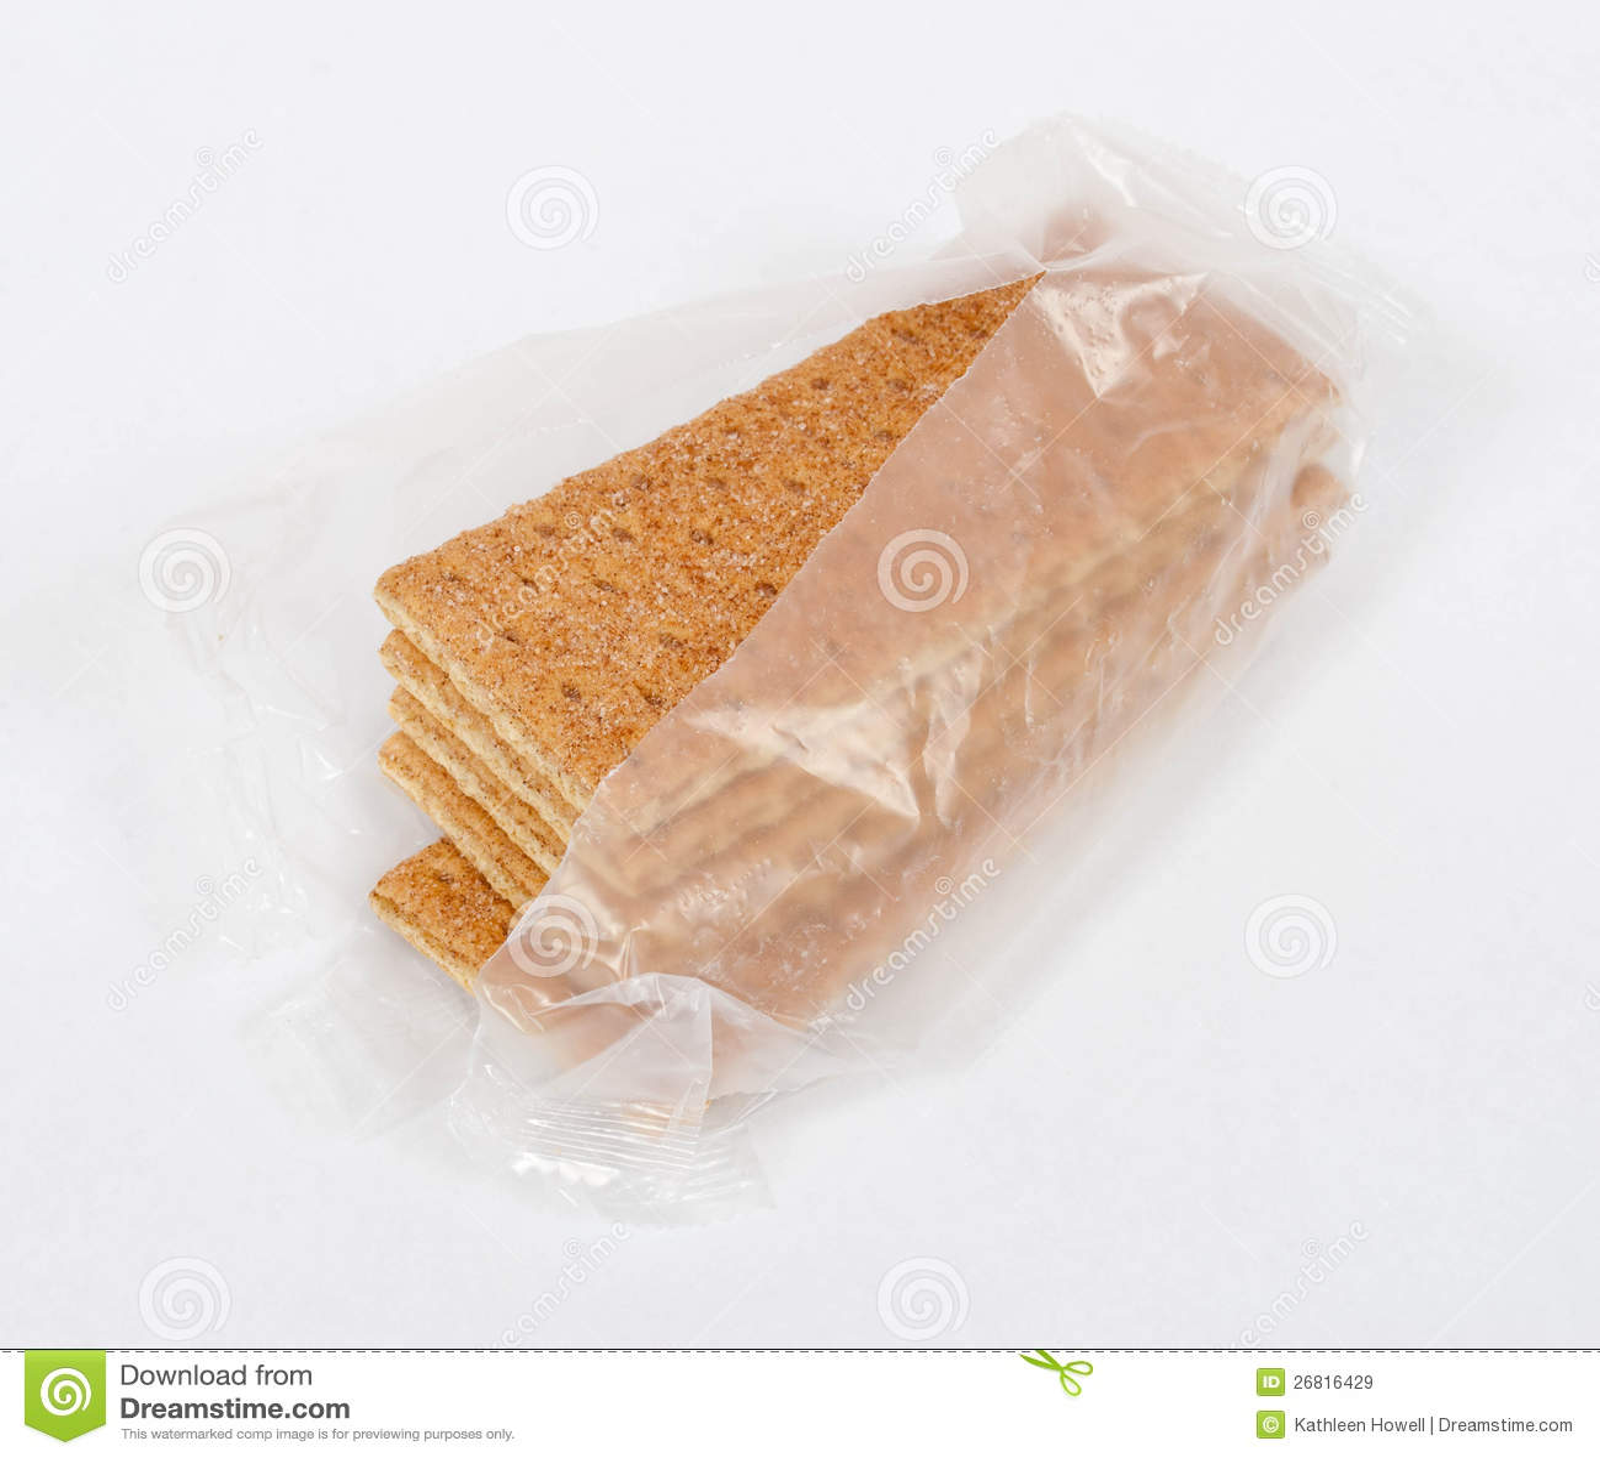 Cinnamon Sugar Graham Crackers Royalty Free Stock Images ...